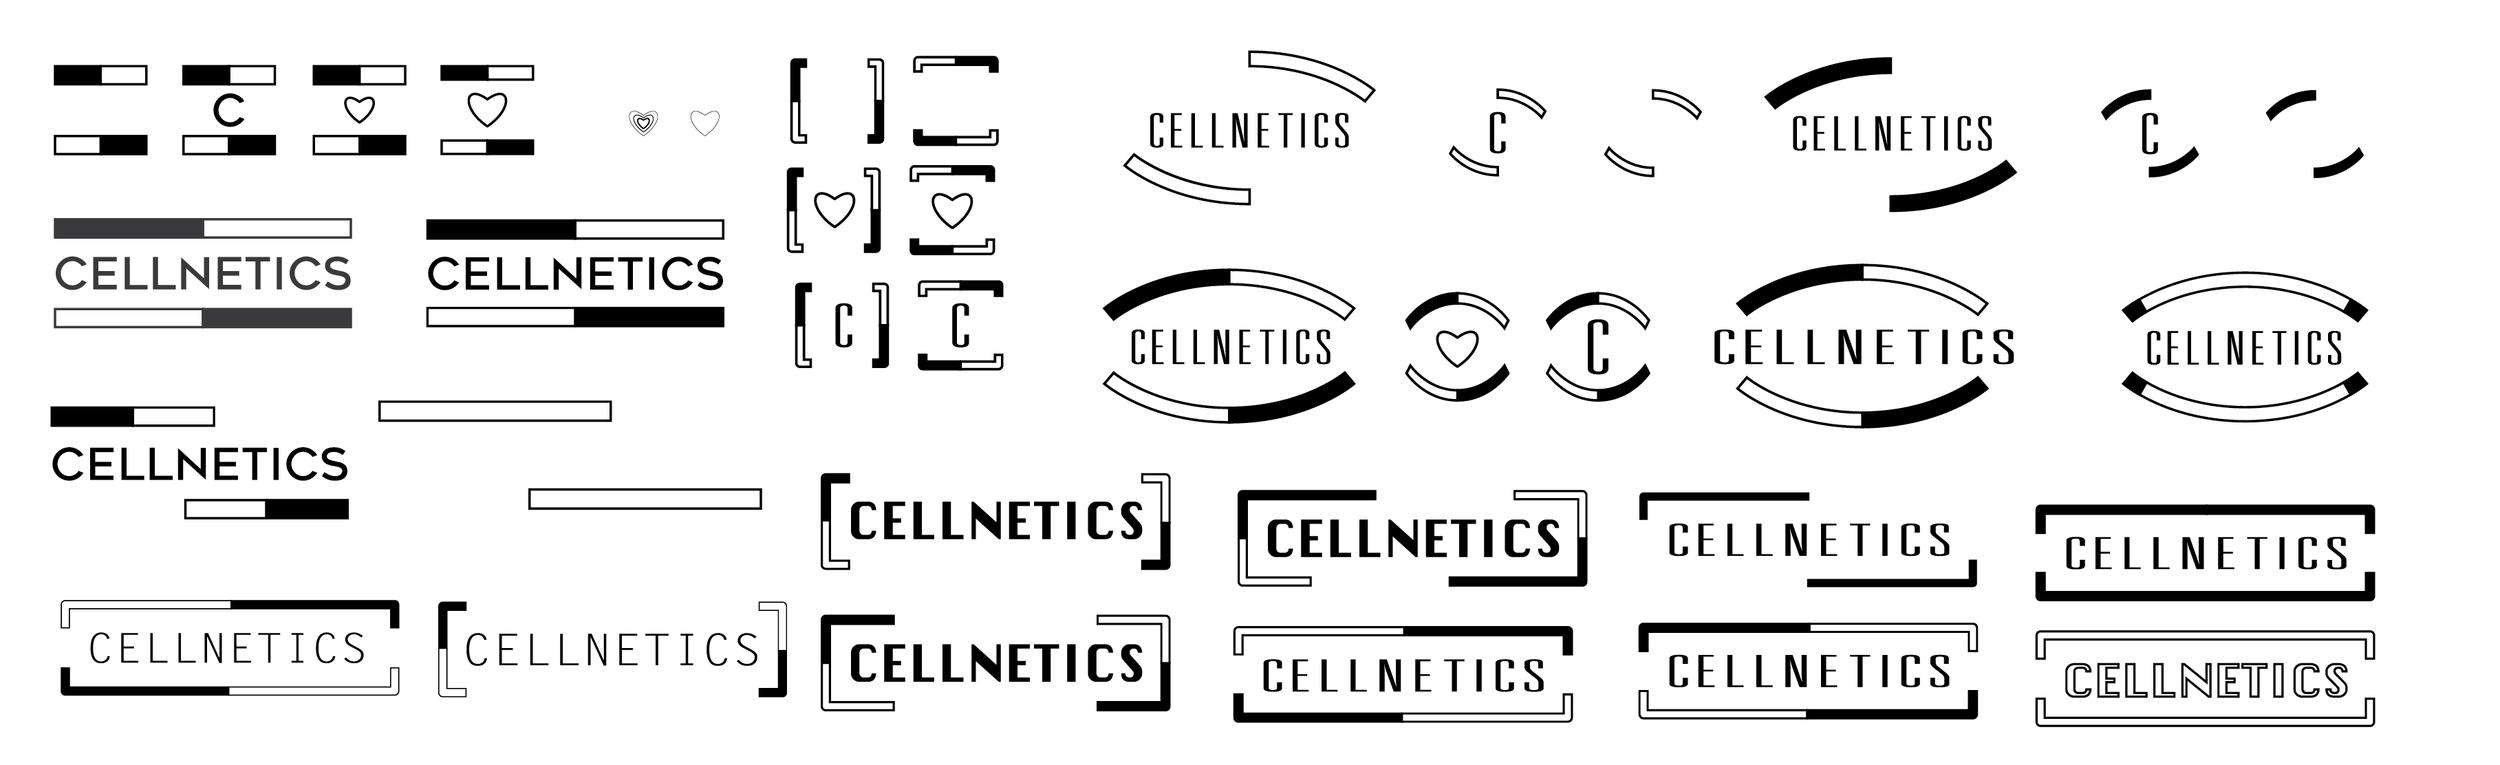 cellnetics web-02.png